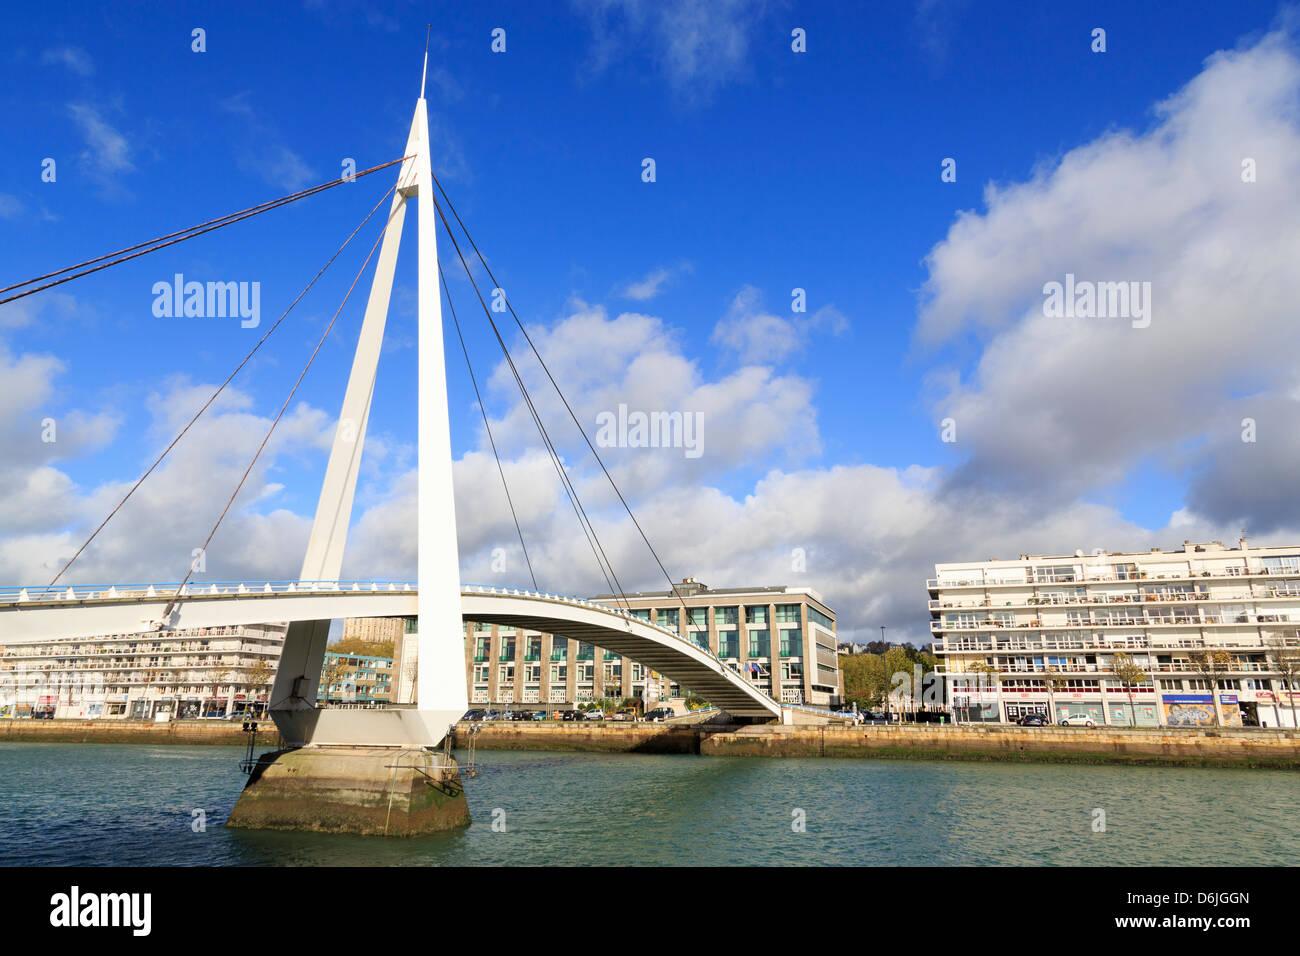 Pedestrian bridge over the Commerce Basin, Le Havre, Normandy, France, Europe - Stock Image